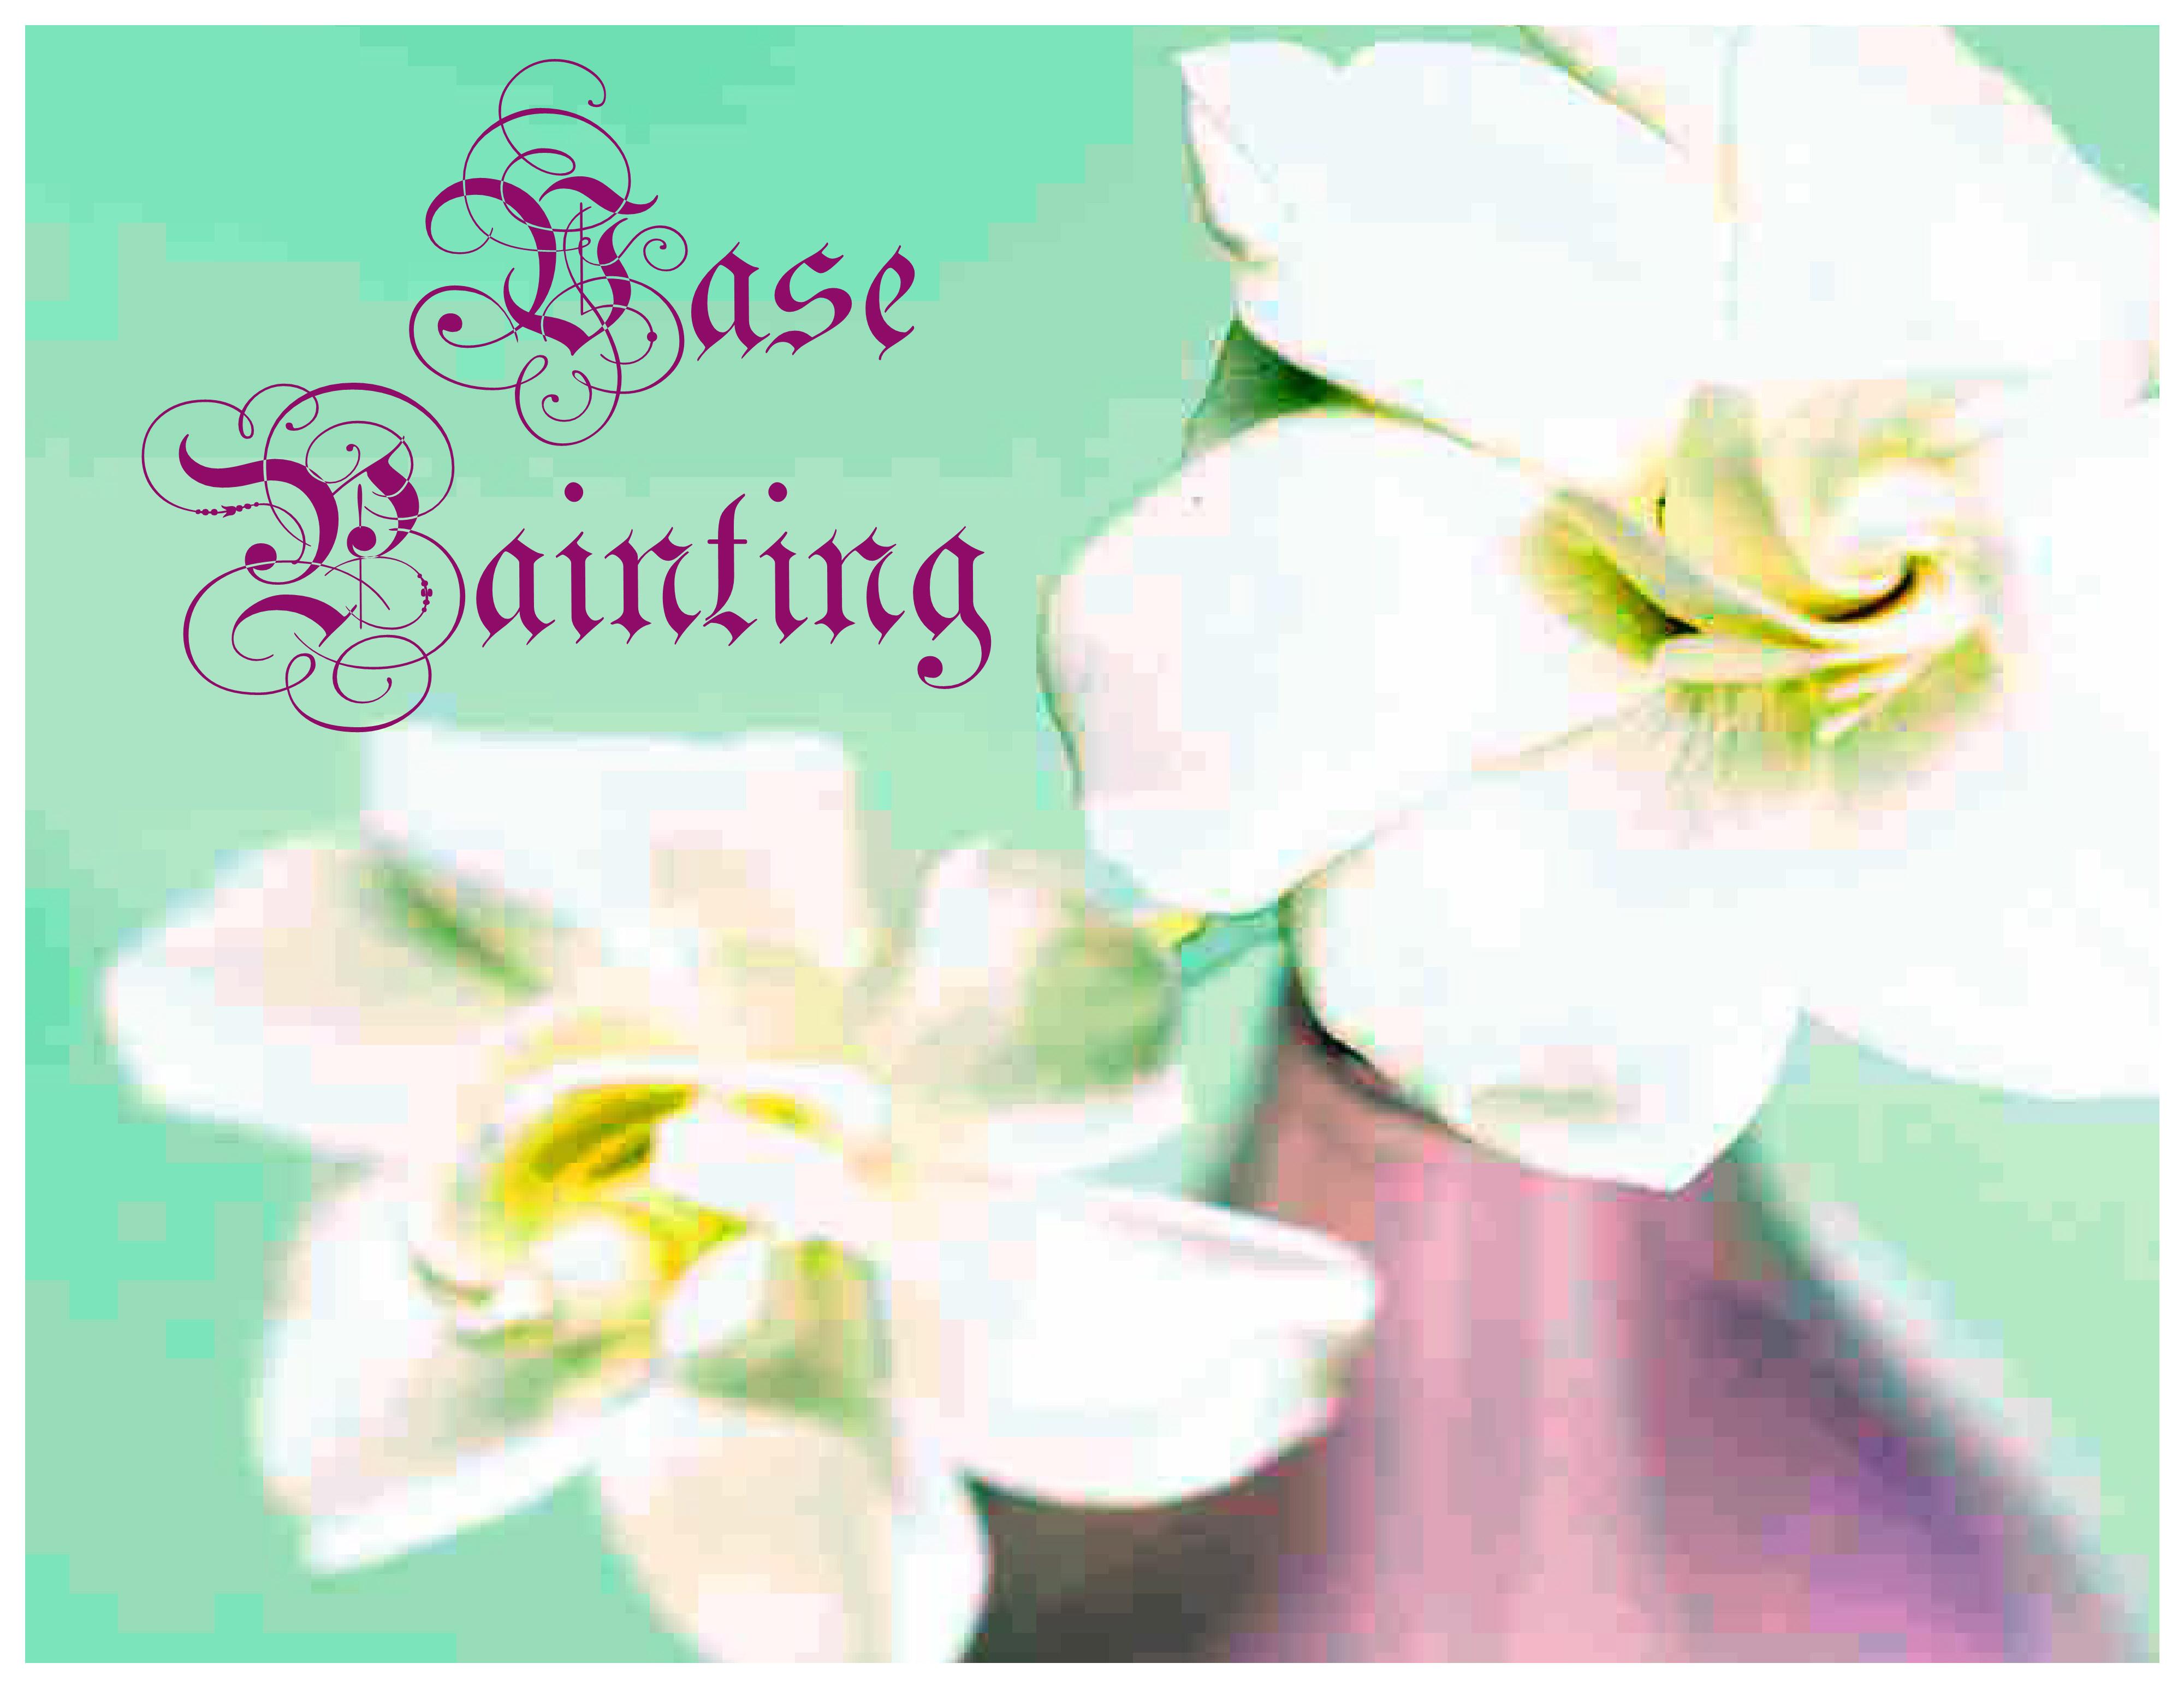 Vase Painting JWC 2014.jpg